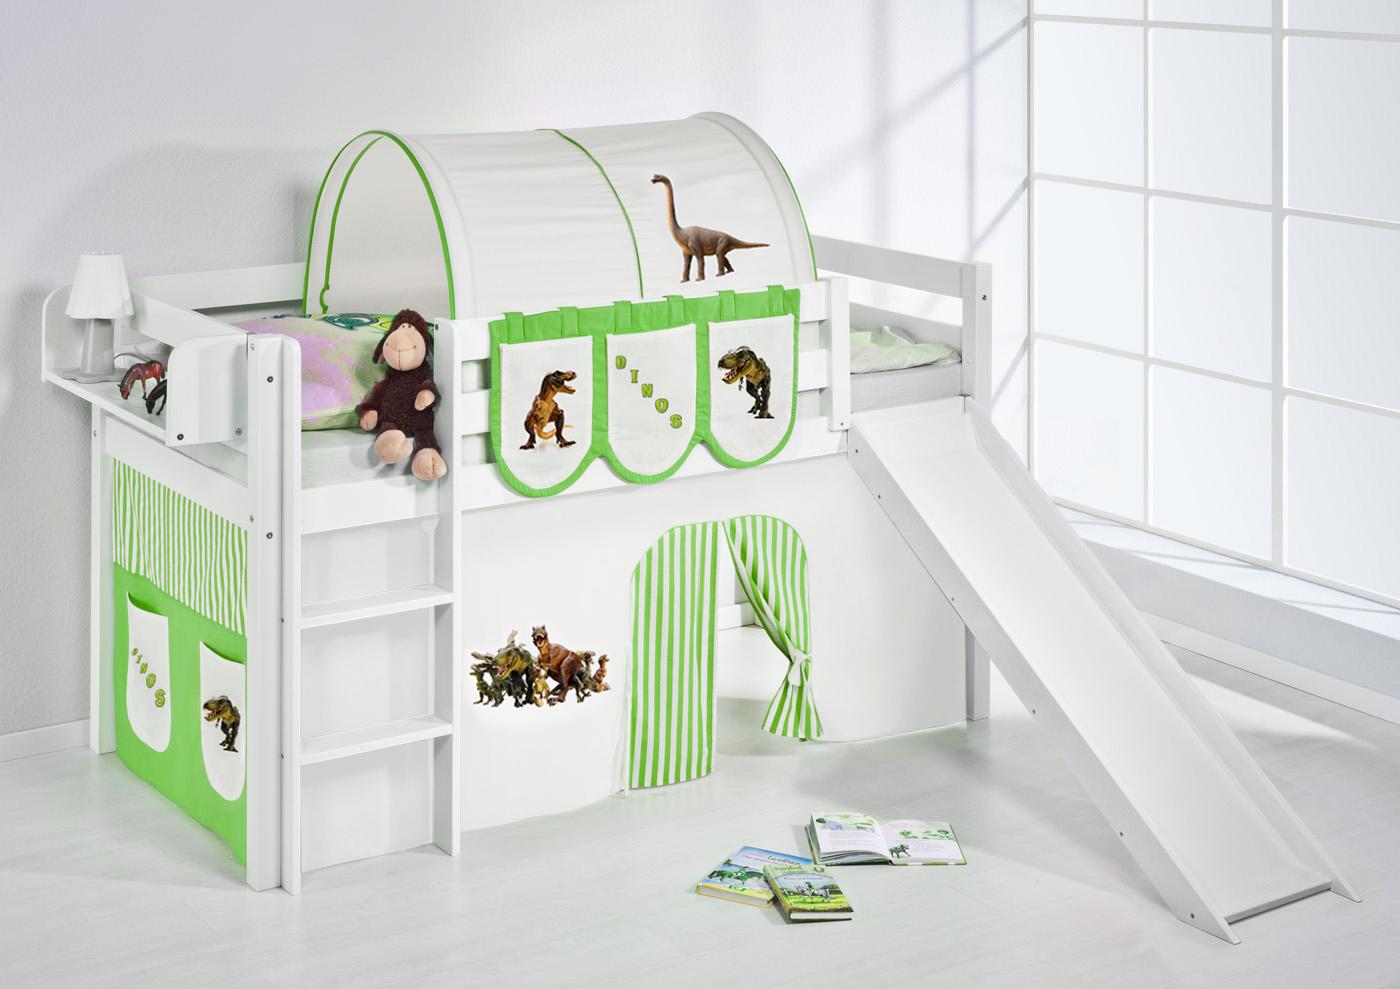 Bezaubernd Hochbett Kinder Beste Wahl Spielbett-hochbett-kinderbett-kinder-bett-jelle-mit-rutsche-